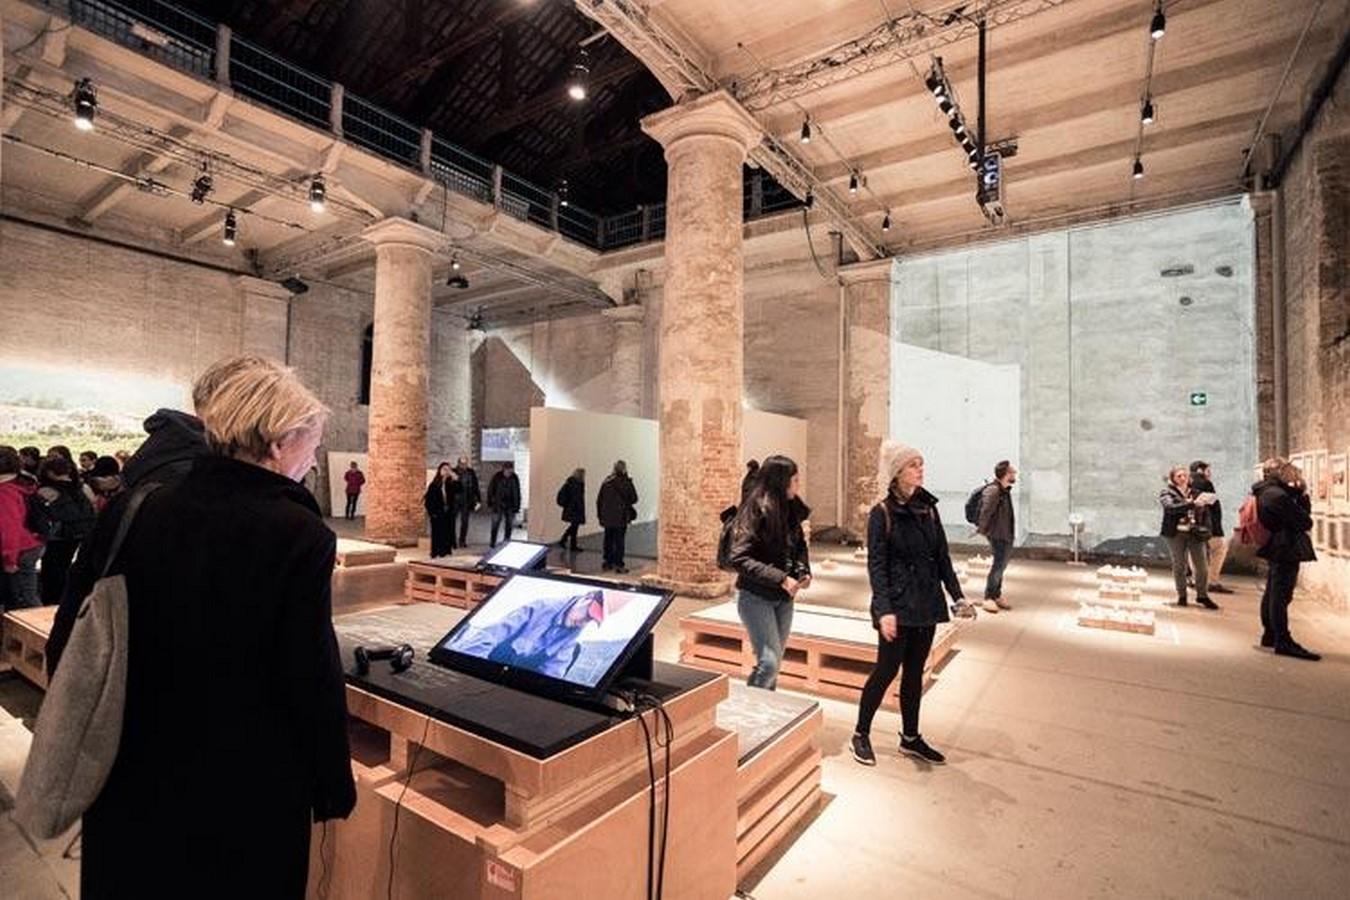 La Biennale di Venezia (Venice Architecture Biennale)-Sheet1